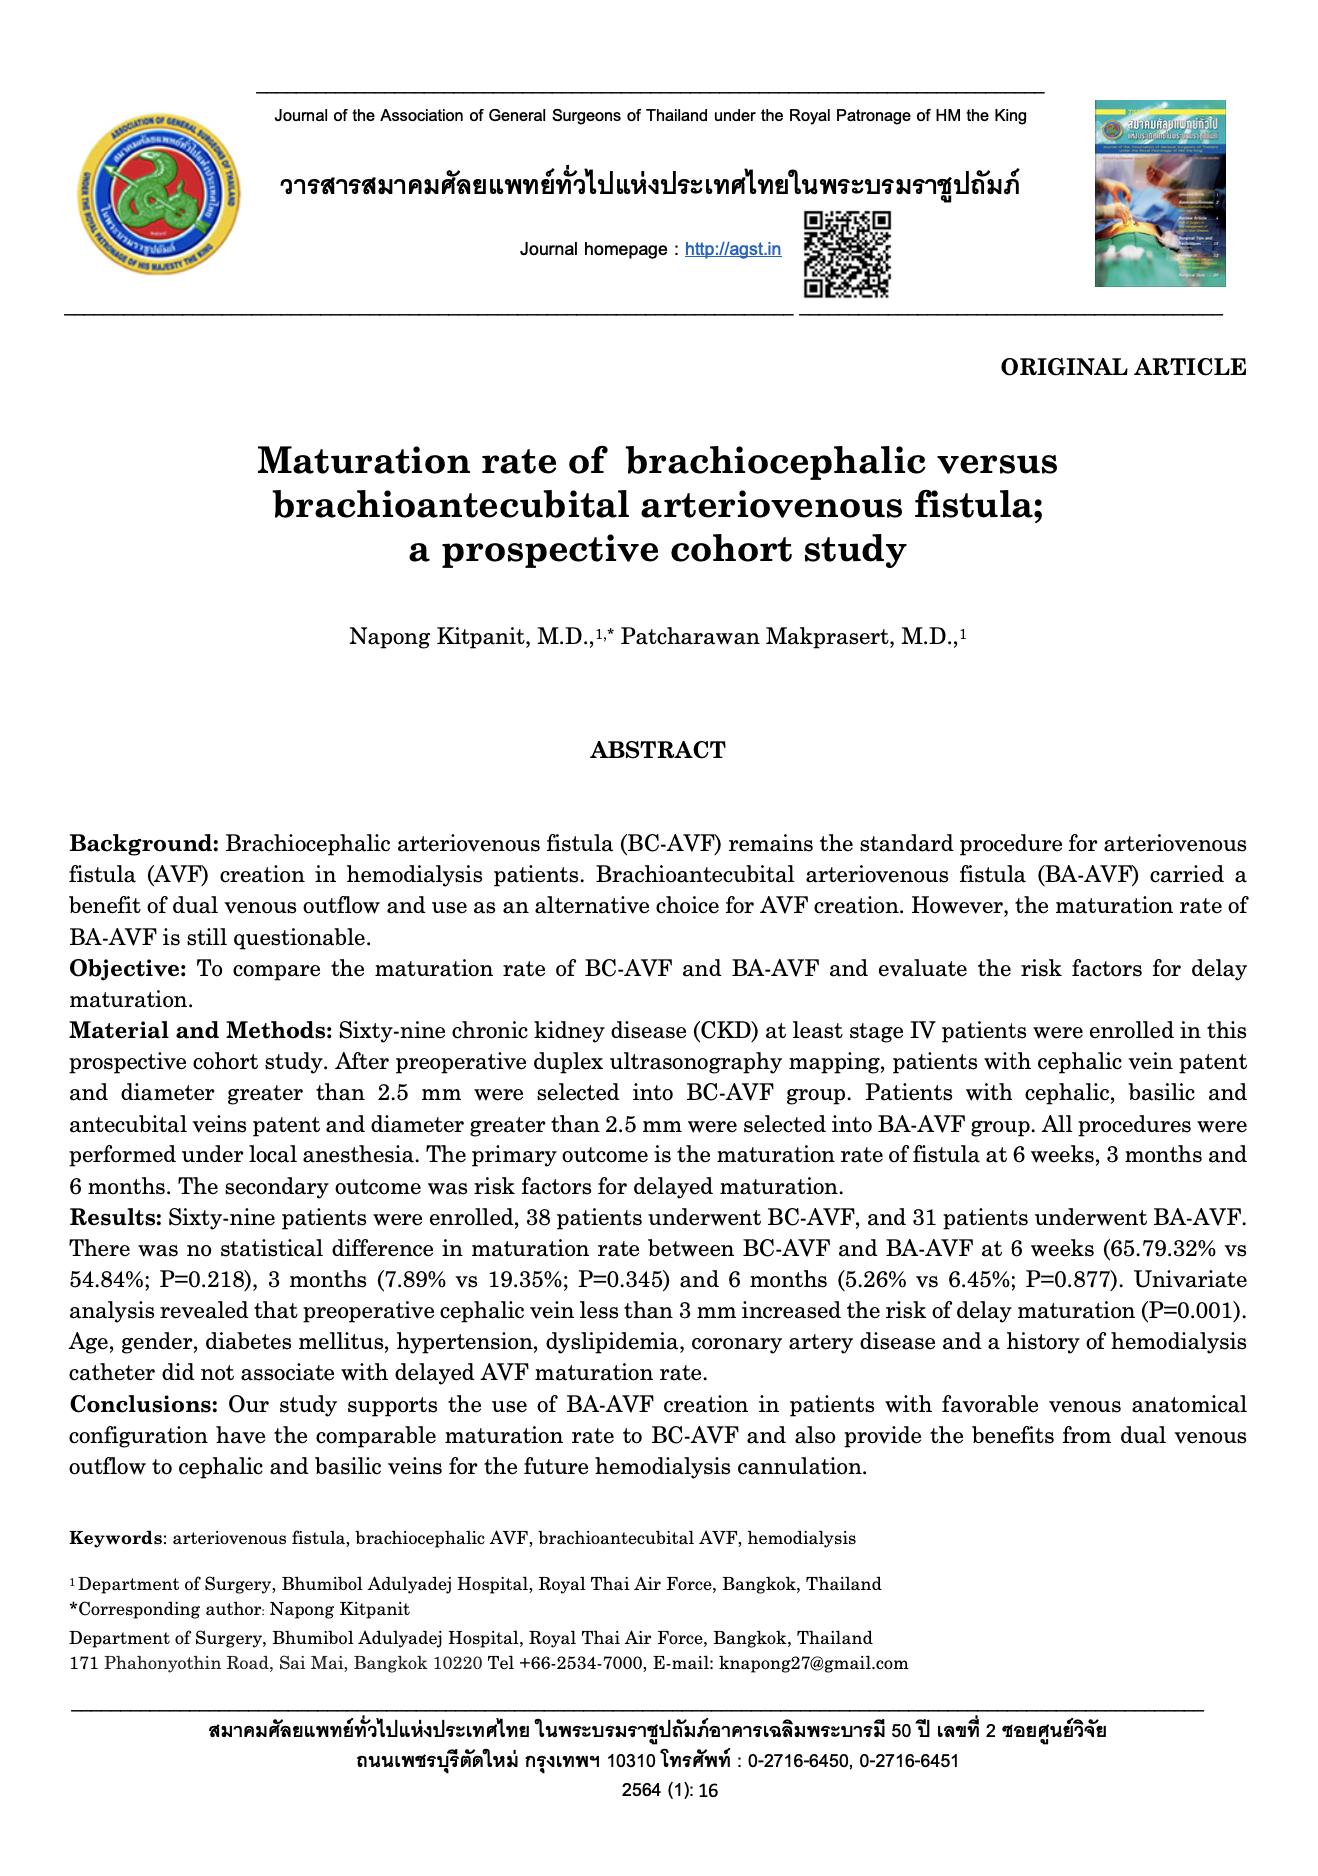 Maturation Rate of Brachiocephalic VS Brachioantecubital Arteriovenous Fistula; A Prospective Cohort Study